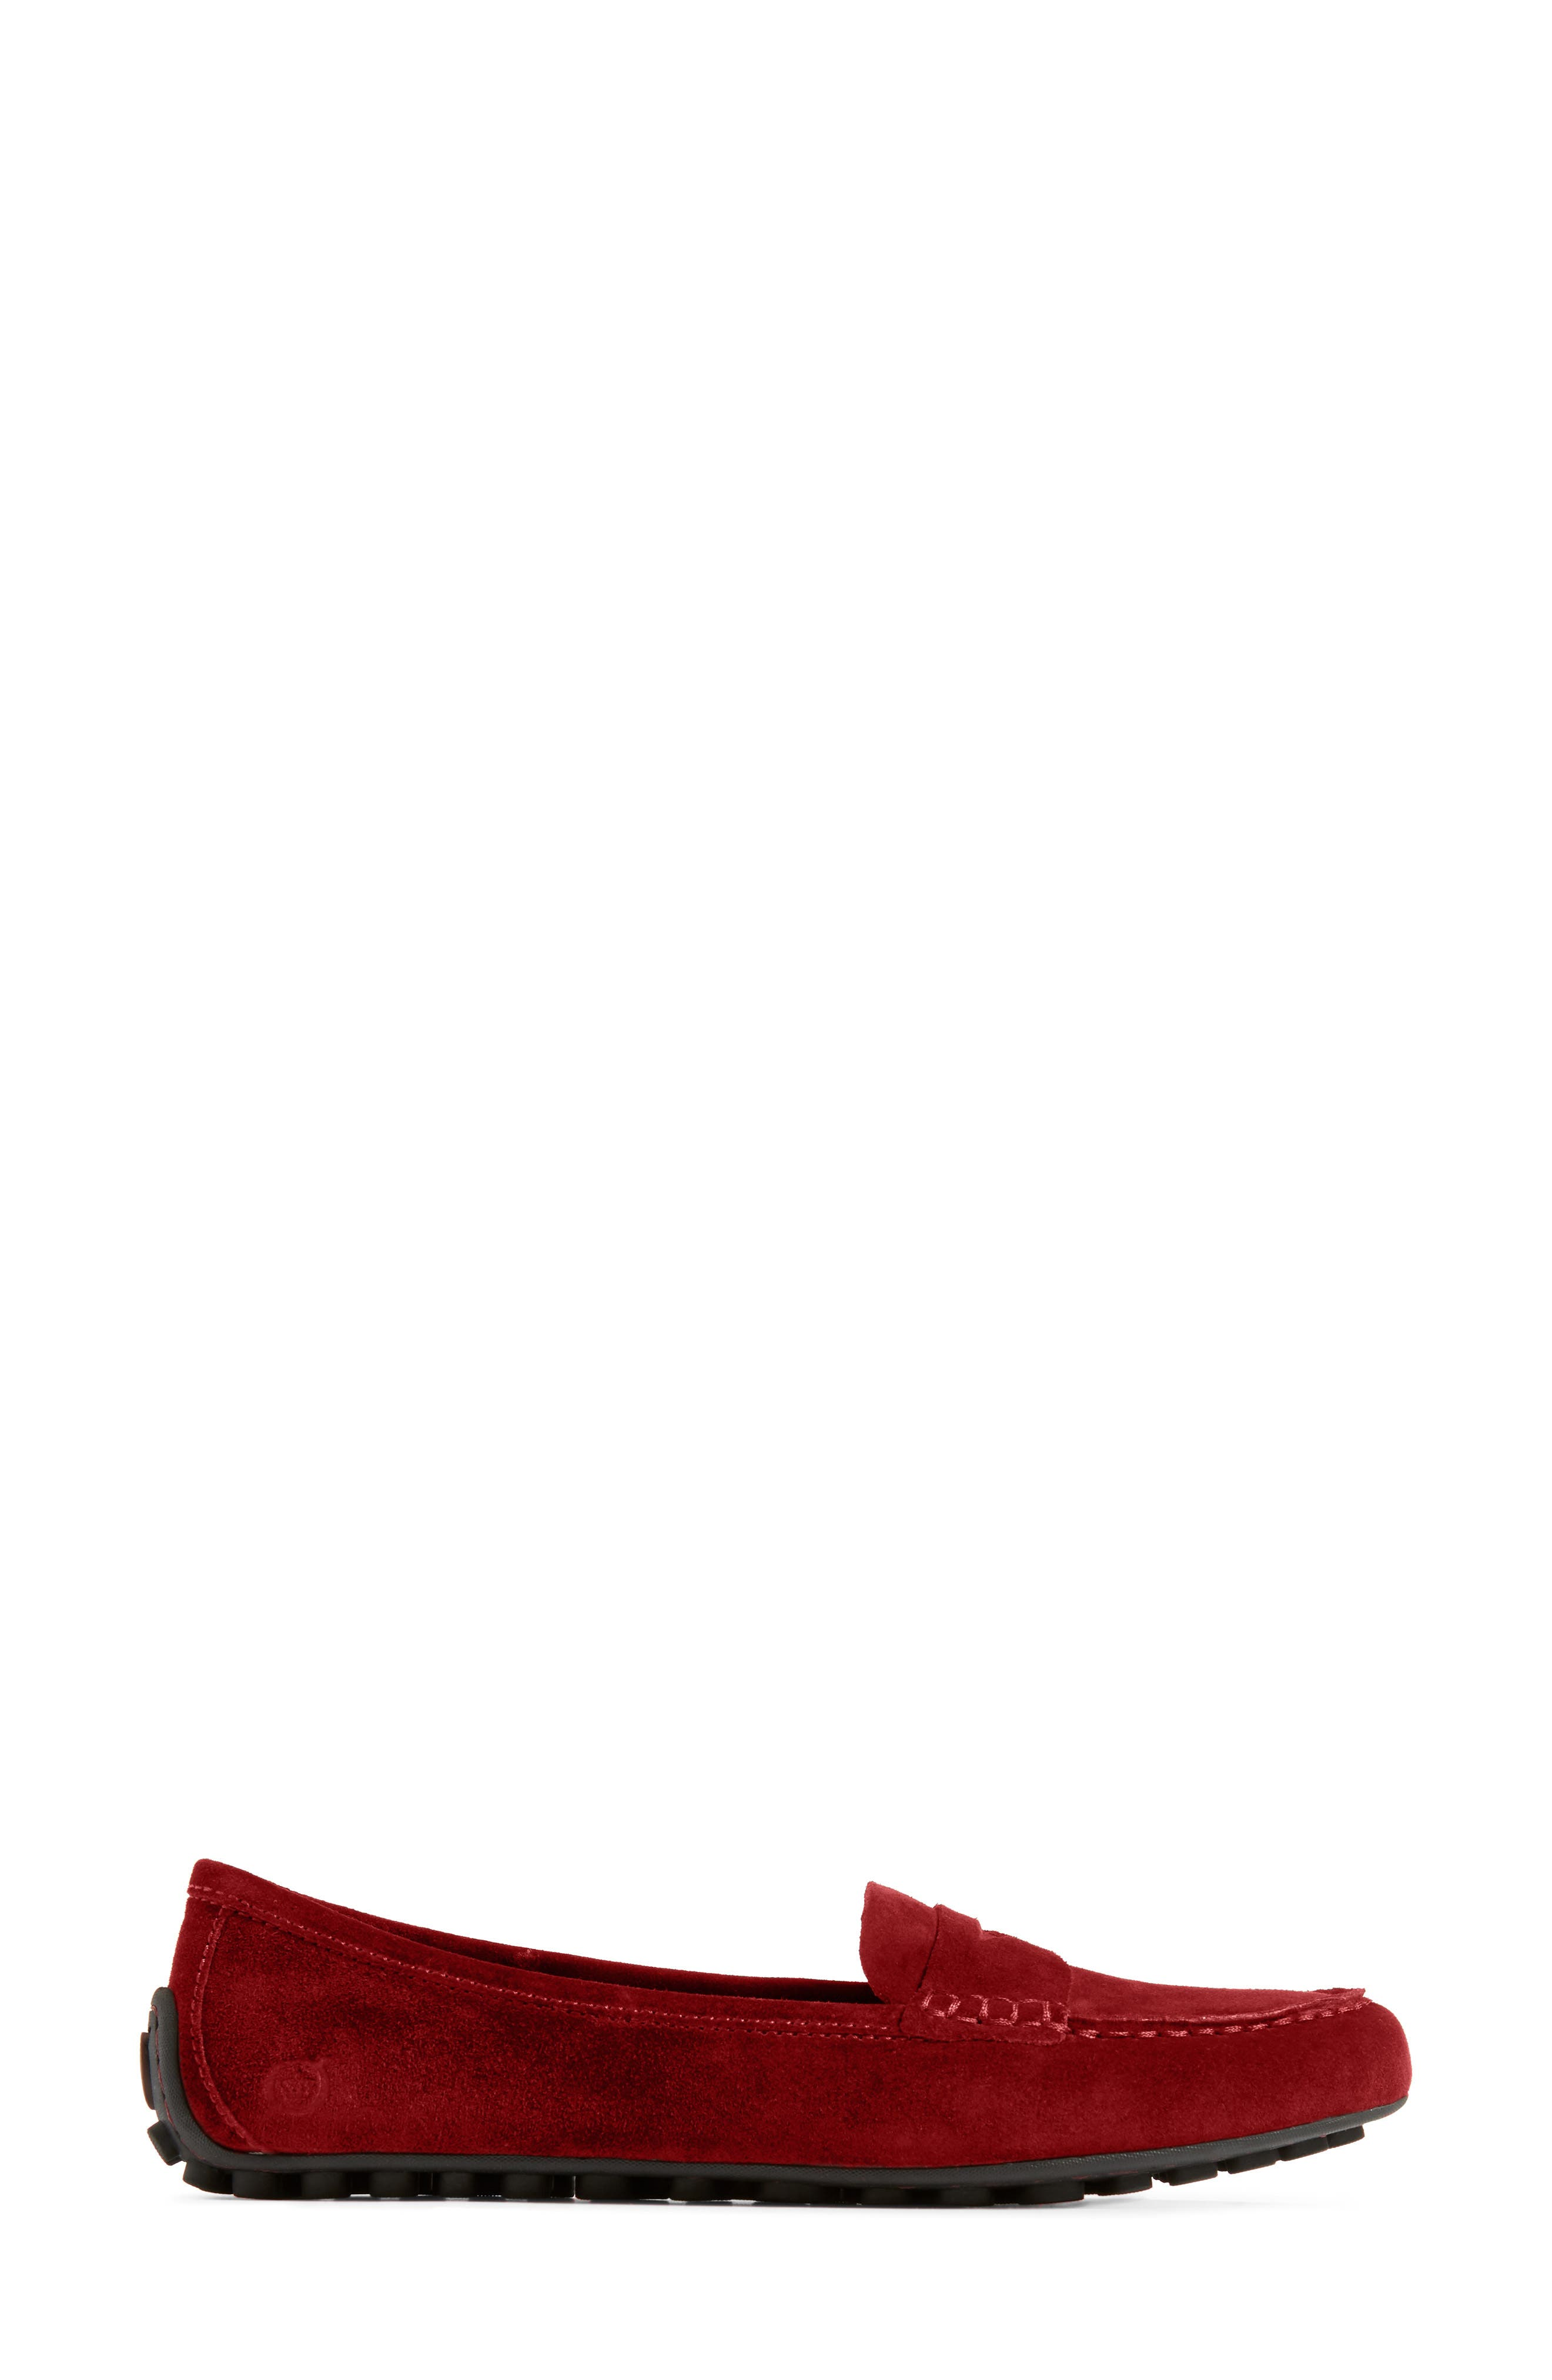 BØRN,                             Malena Penny Loafer,                             Alternate thumbnail 3, color,                             RED SUEDE